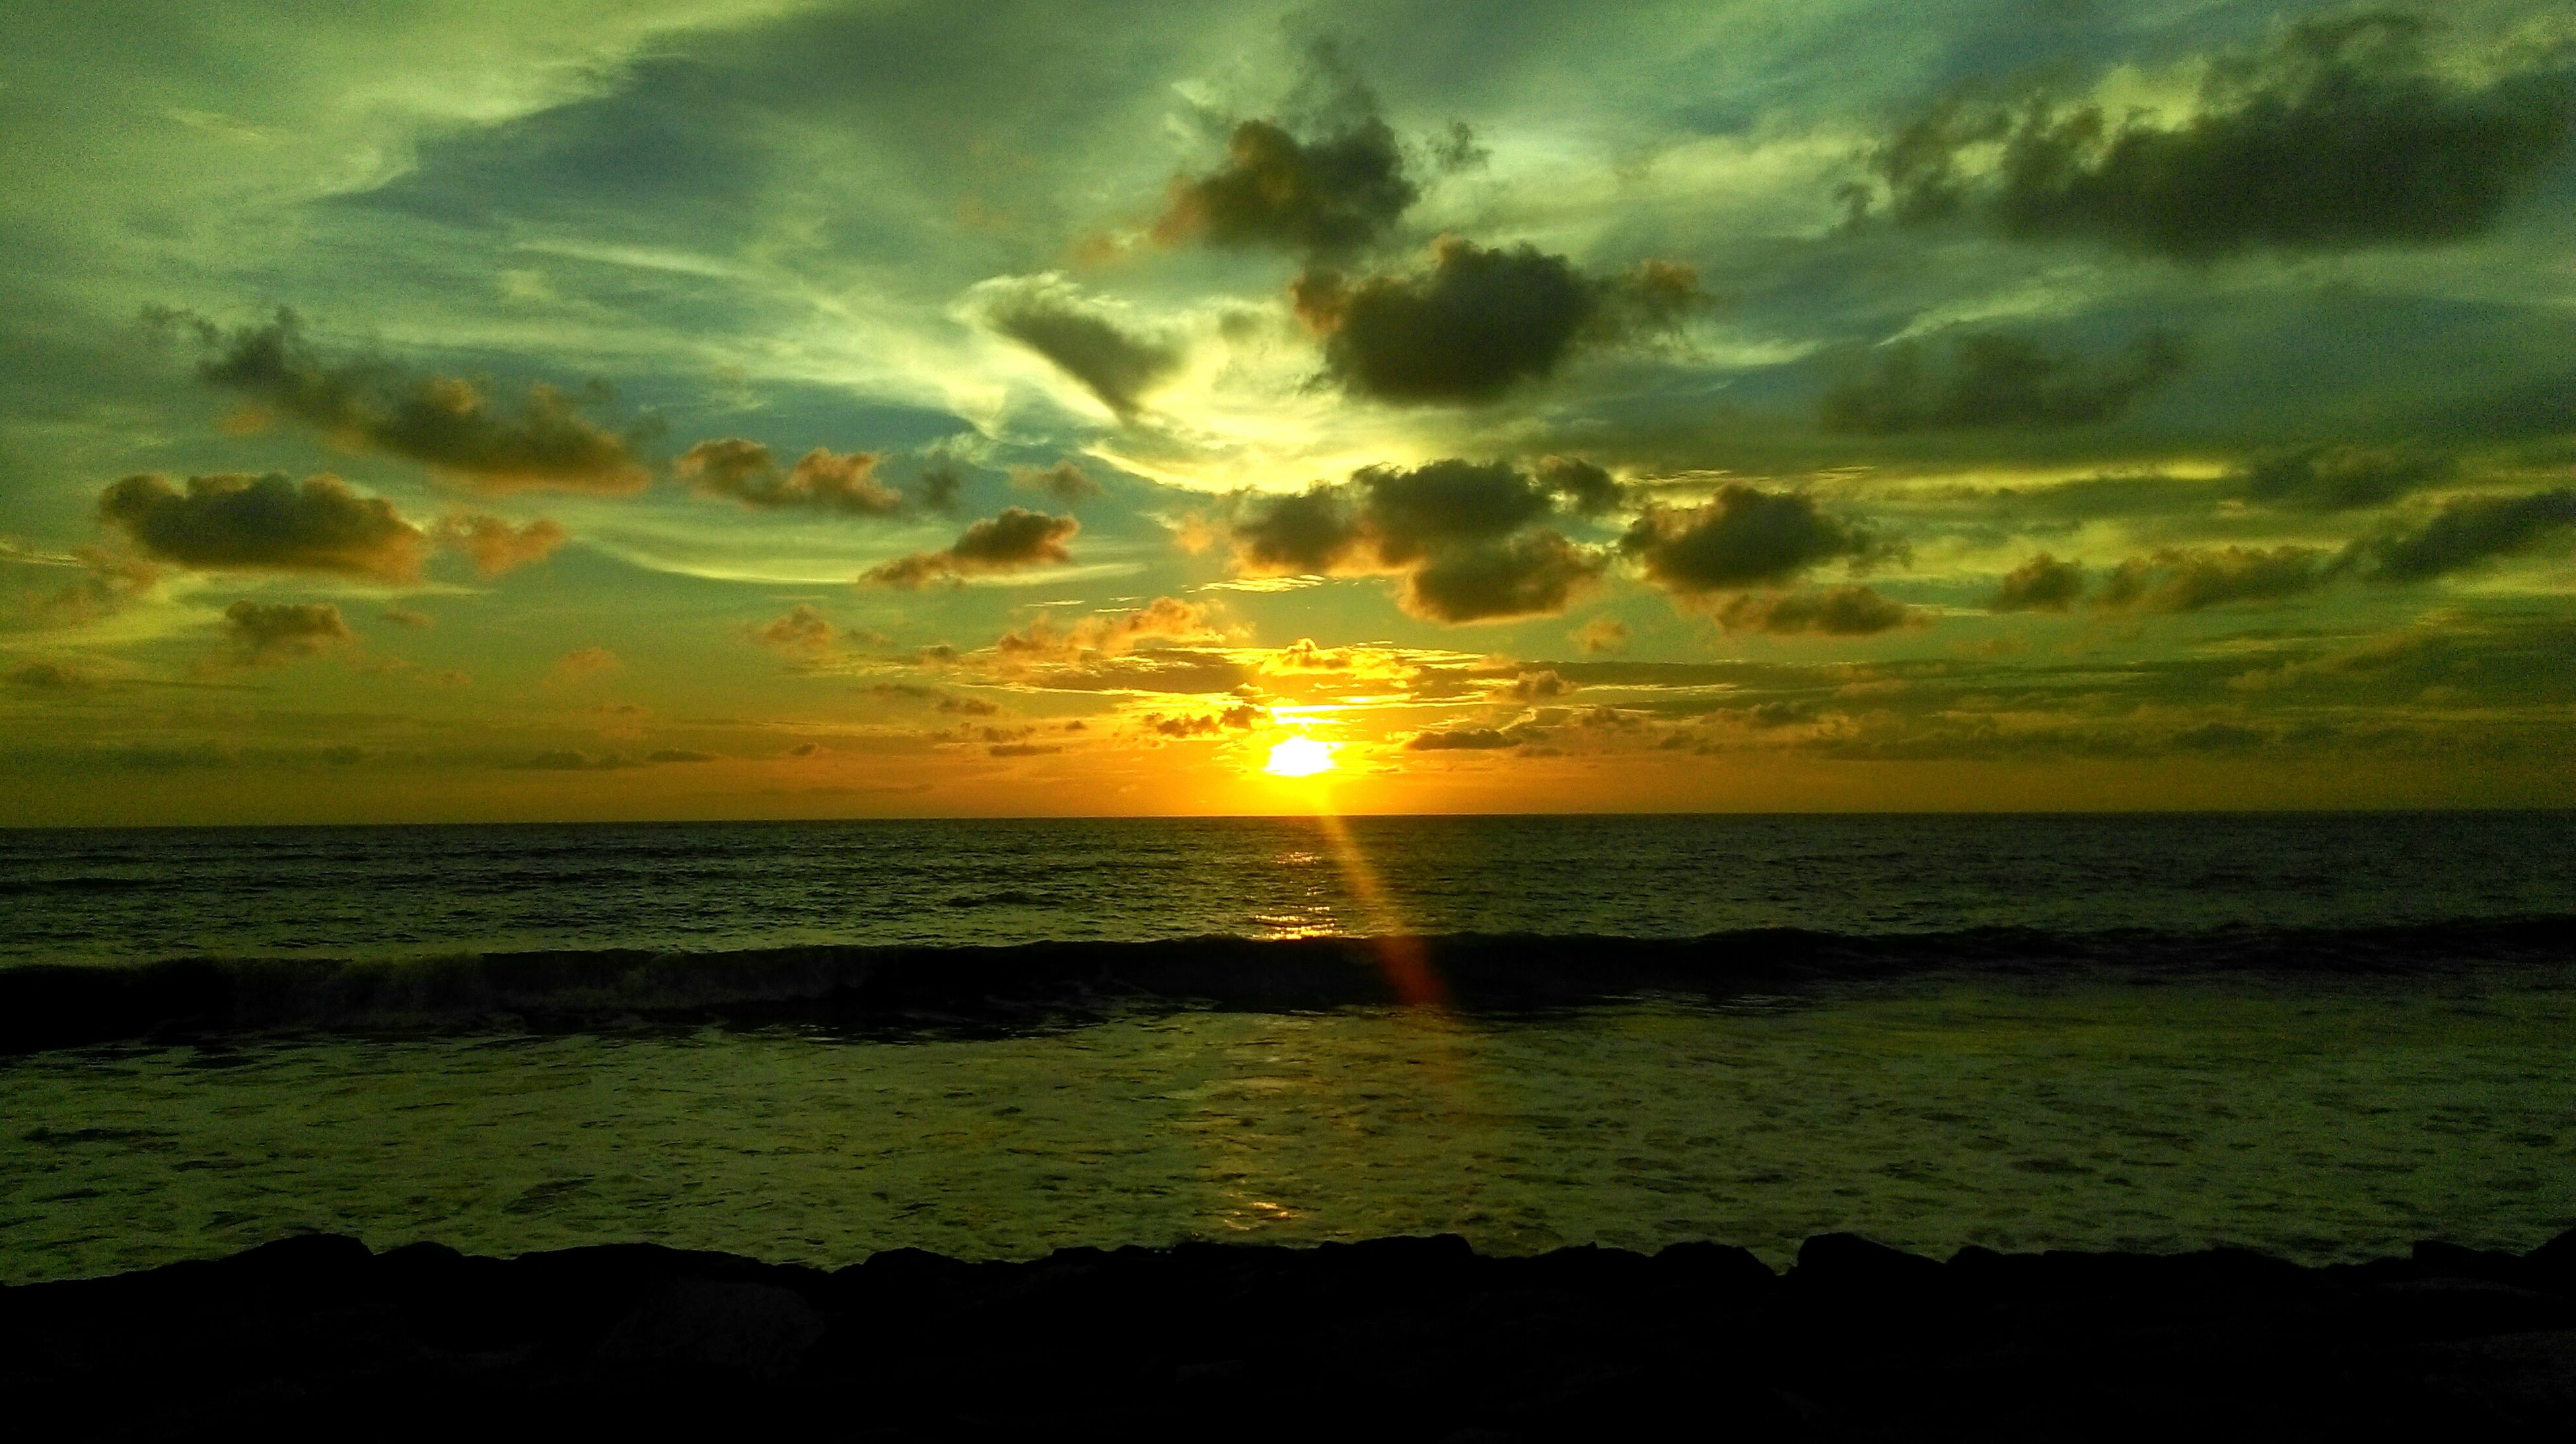 horizon over water, sea, sunset, water, scenics, tranquil scene, sky, beauty in nature, sun, tranquility, beach, cloud - sky, idyllic, shore, nature, cloud, orange color, sunlight, cloudy, seascape